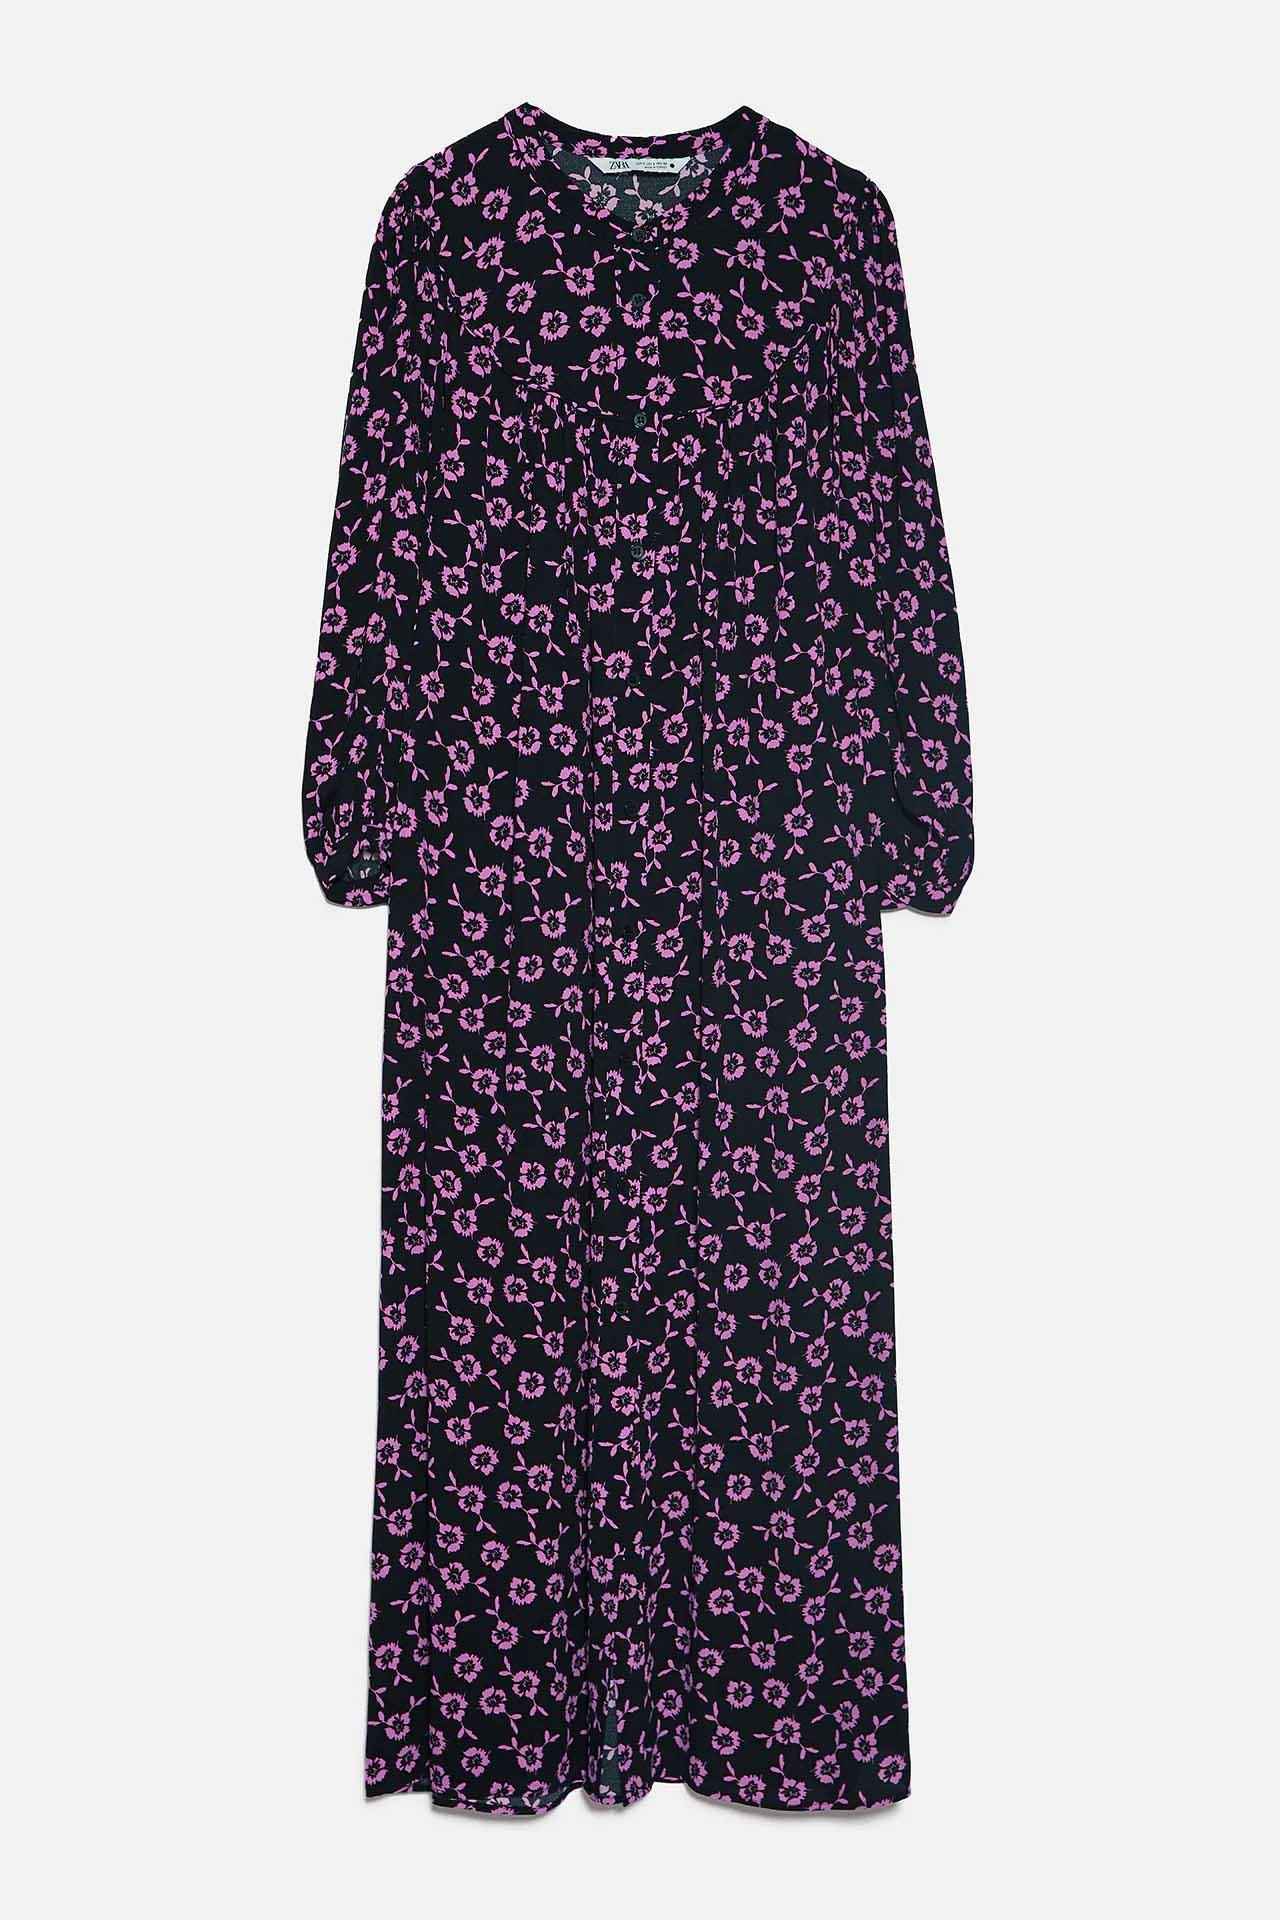 Vestidos midi Zara invierno 2021